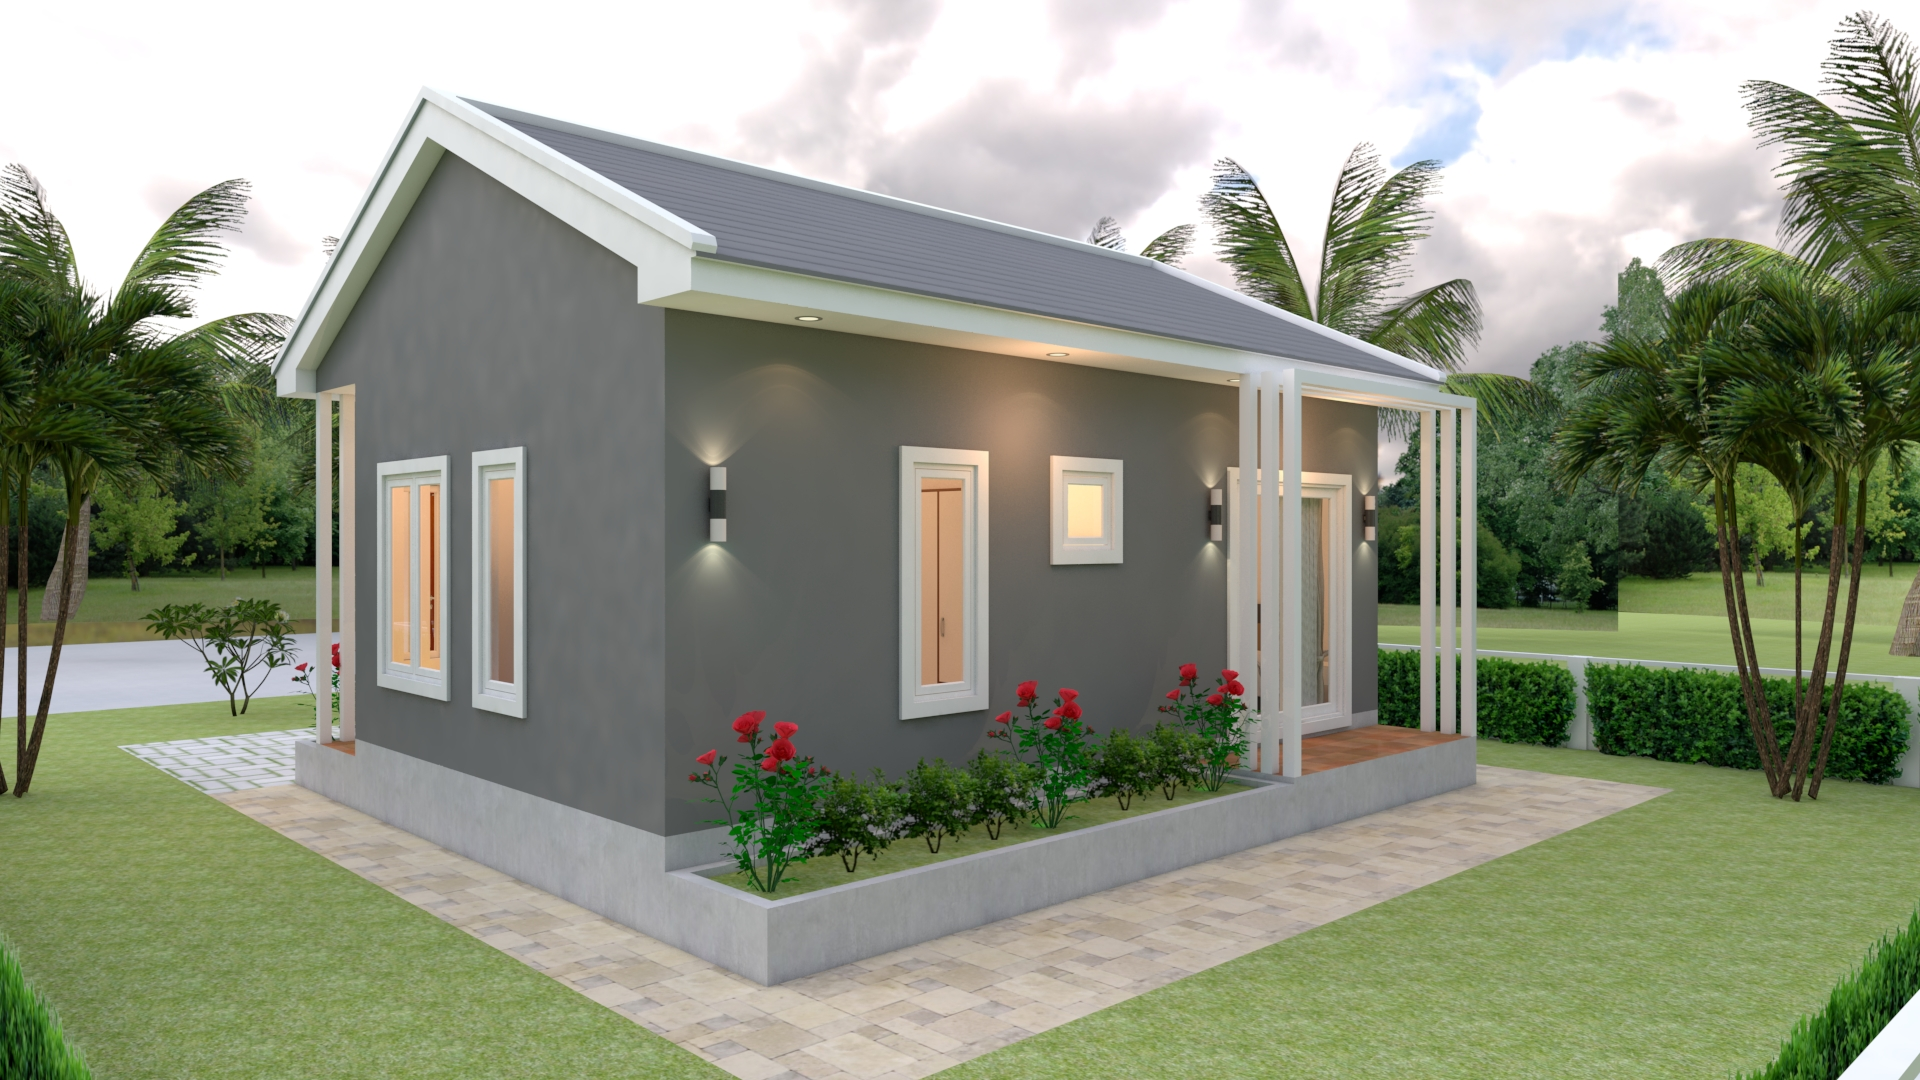 Small 2 Bedroom House 8x6 Meter 26x20 Feet 5